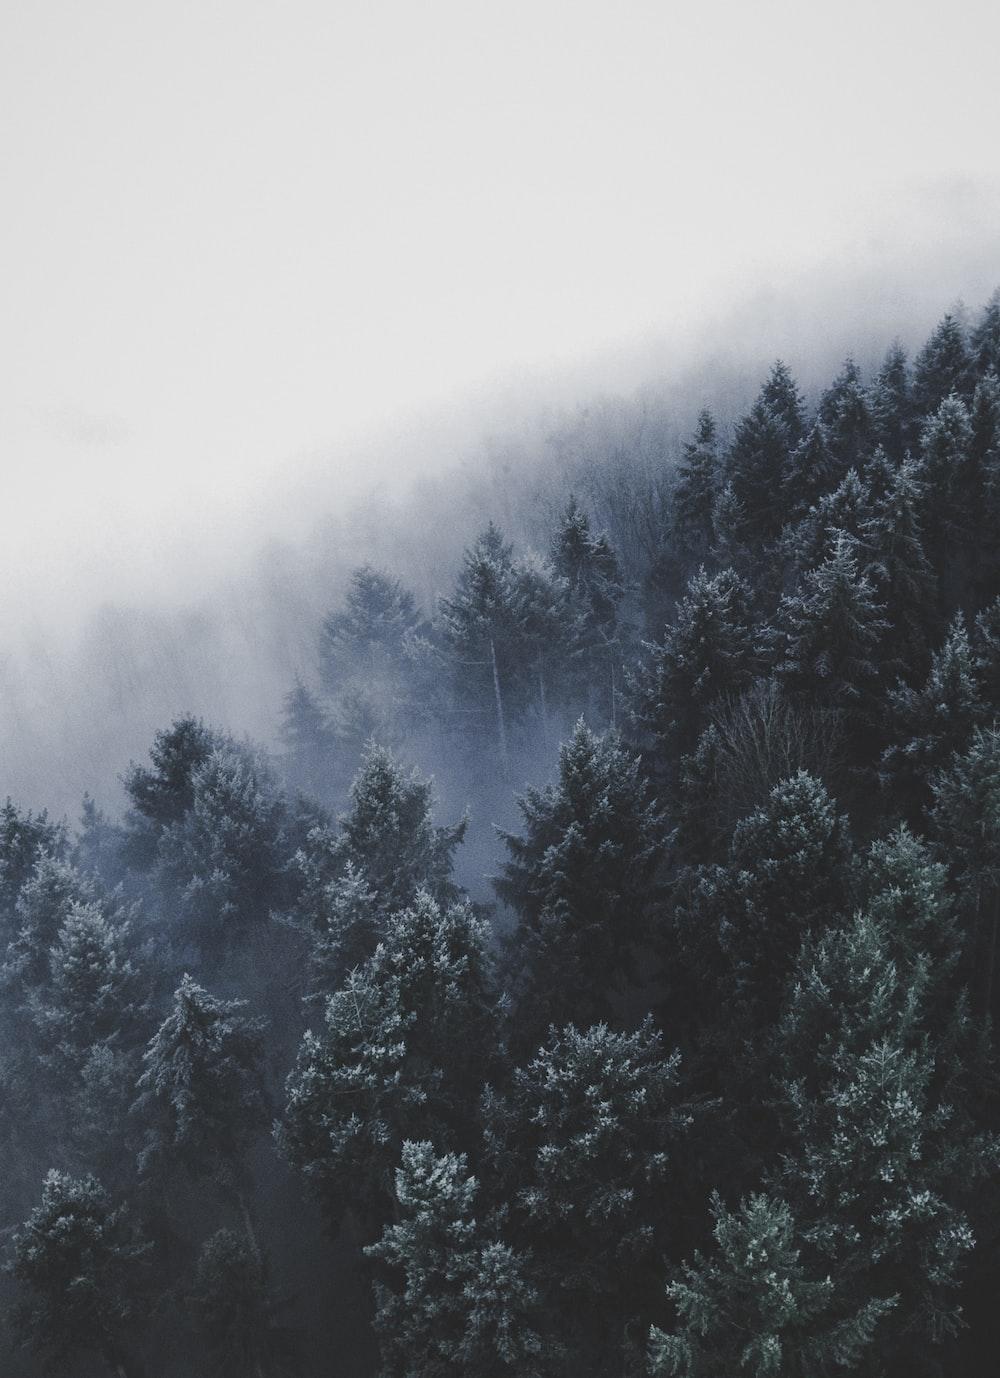 wide angle photo of pine trees